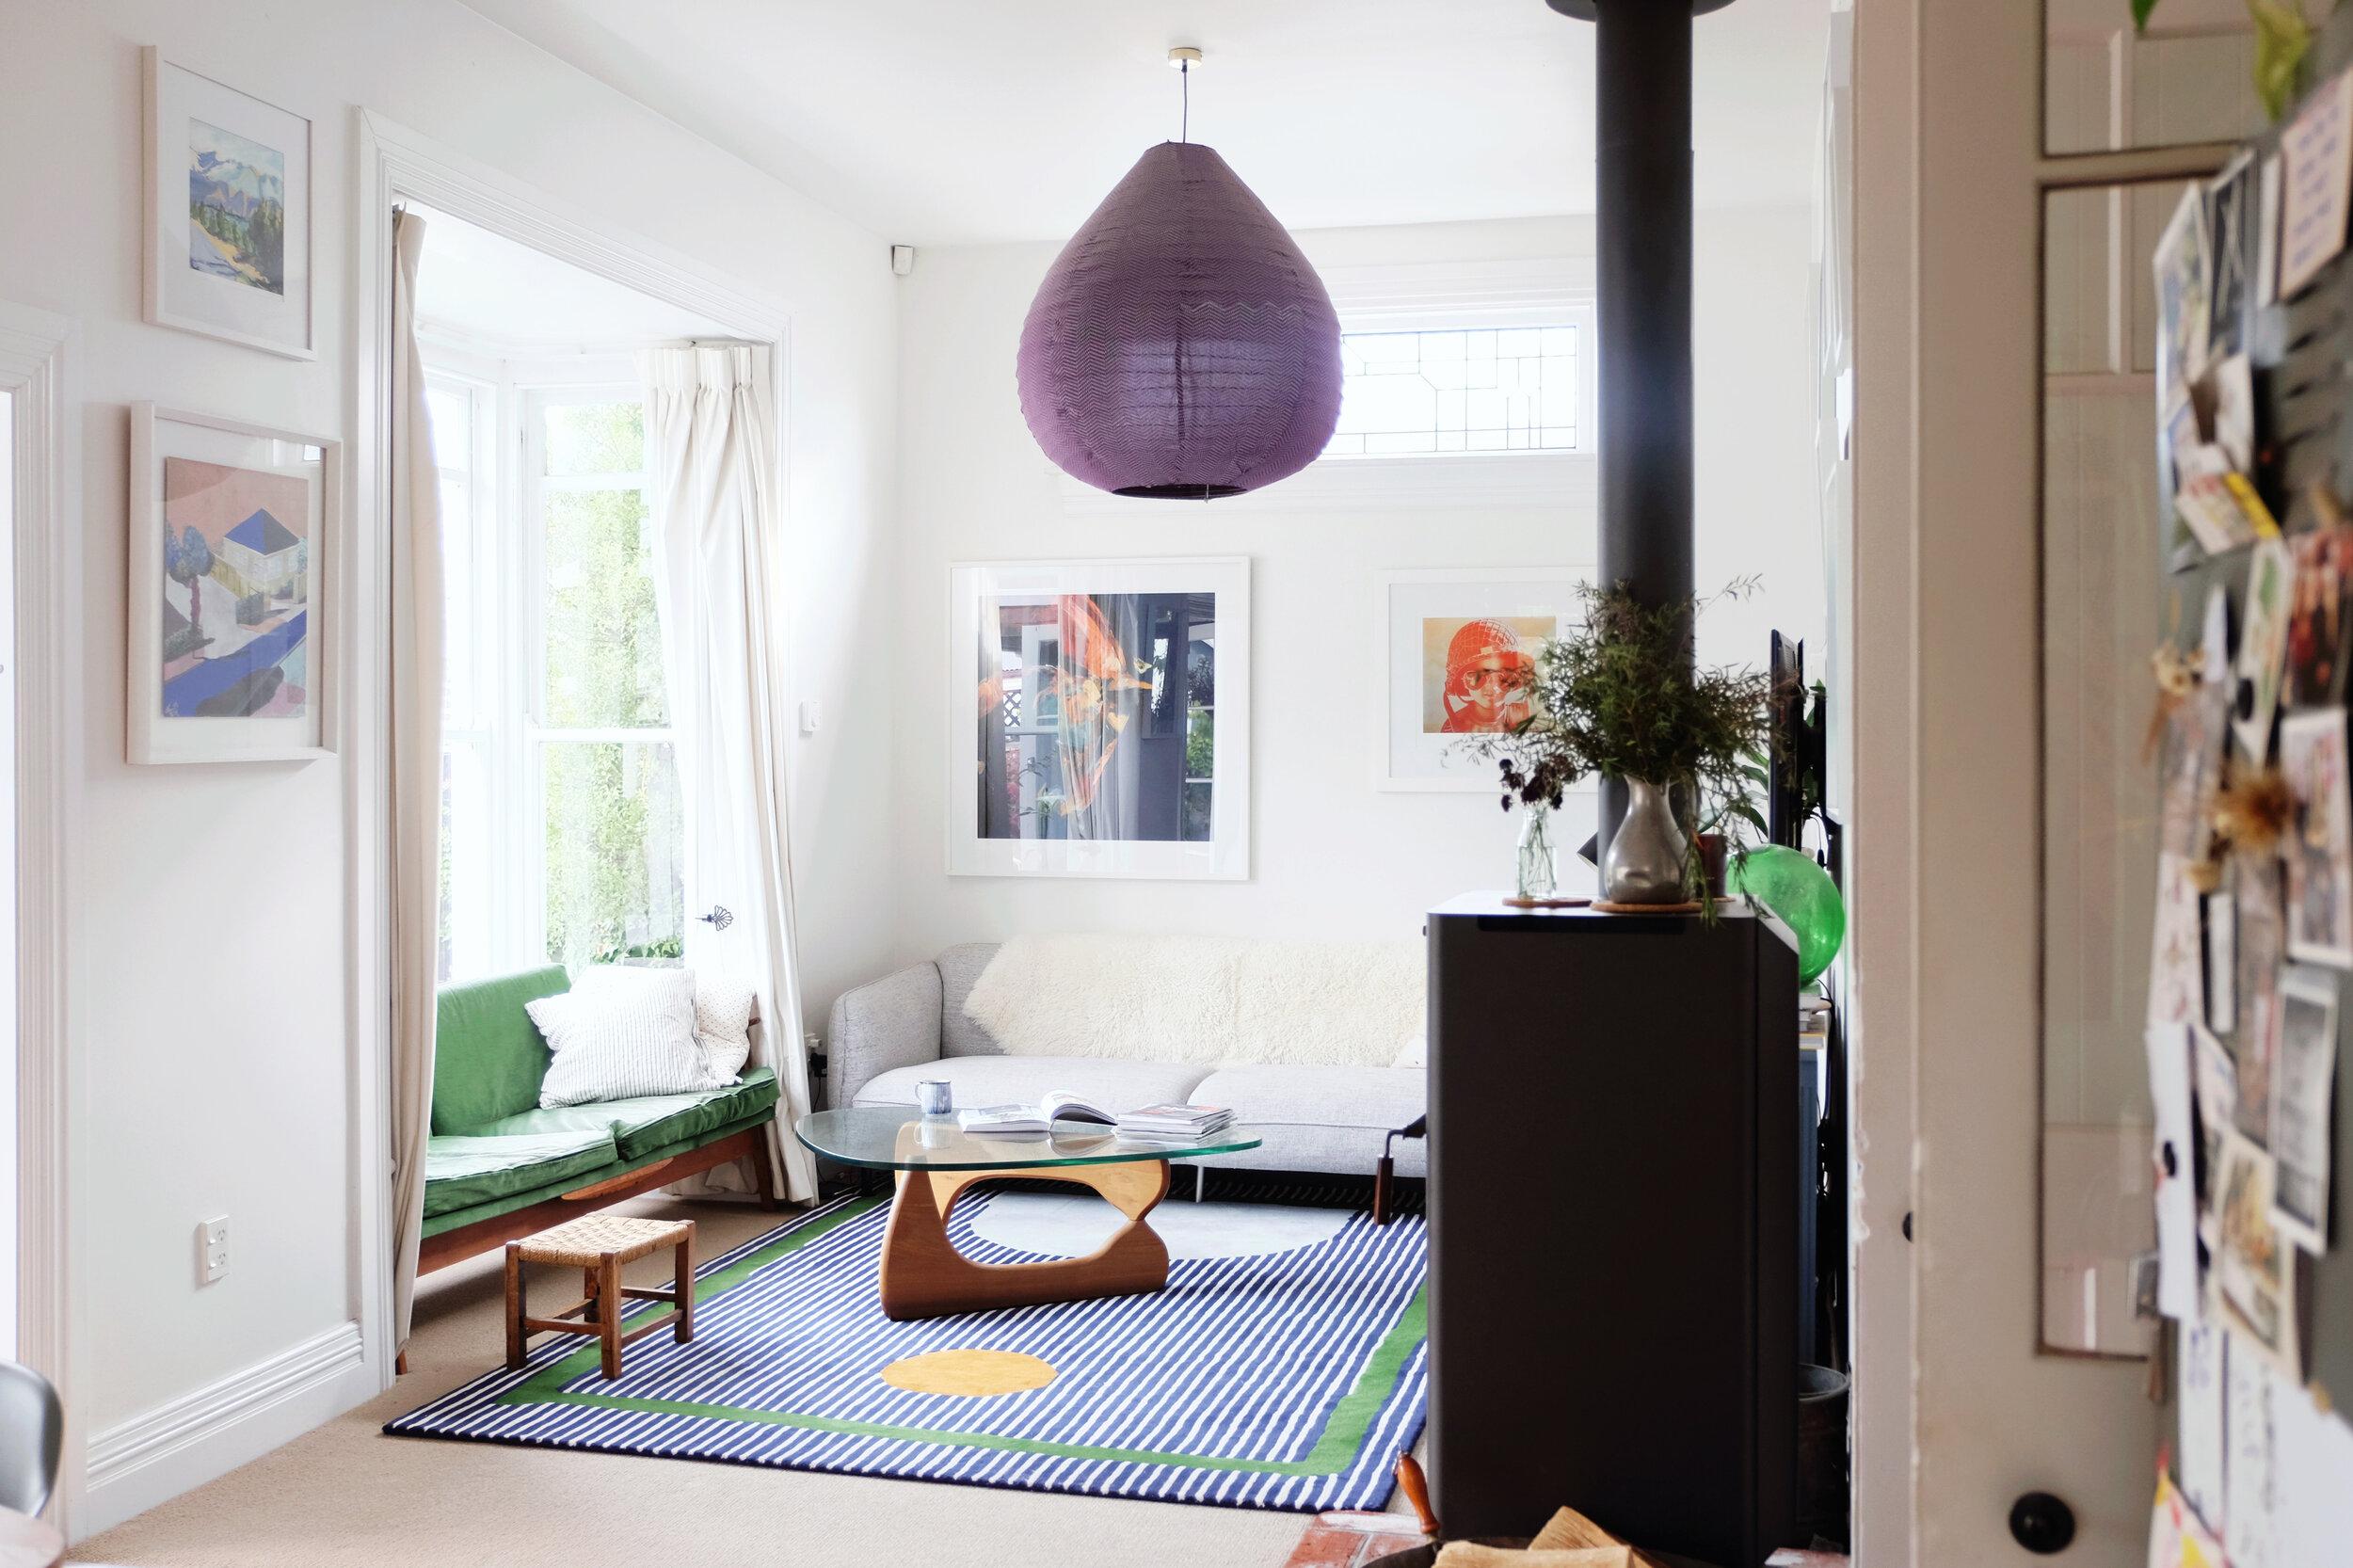 Studio Home X Dilana Rugs